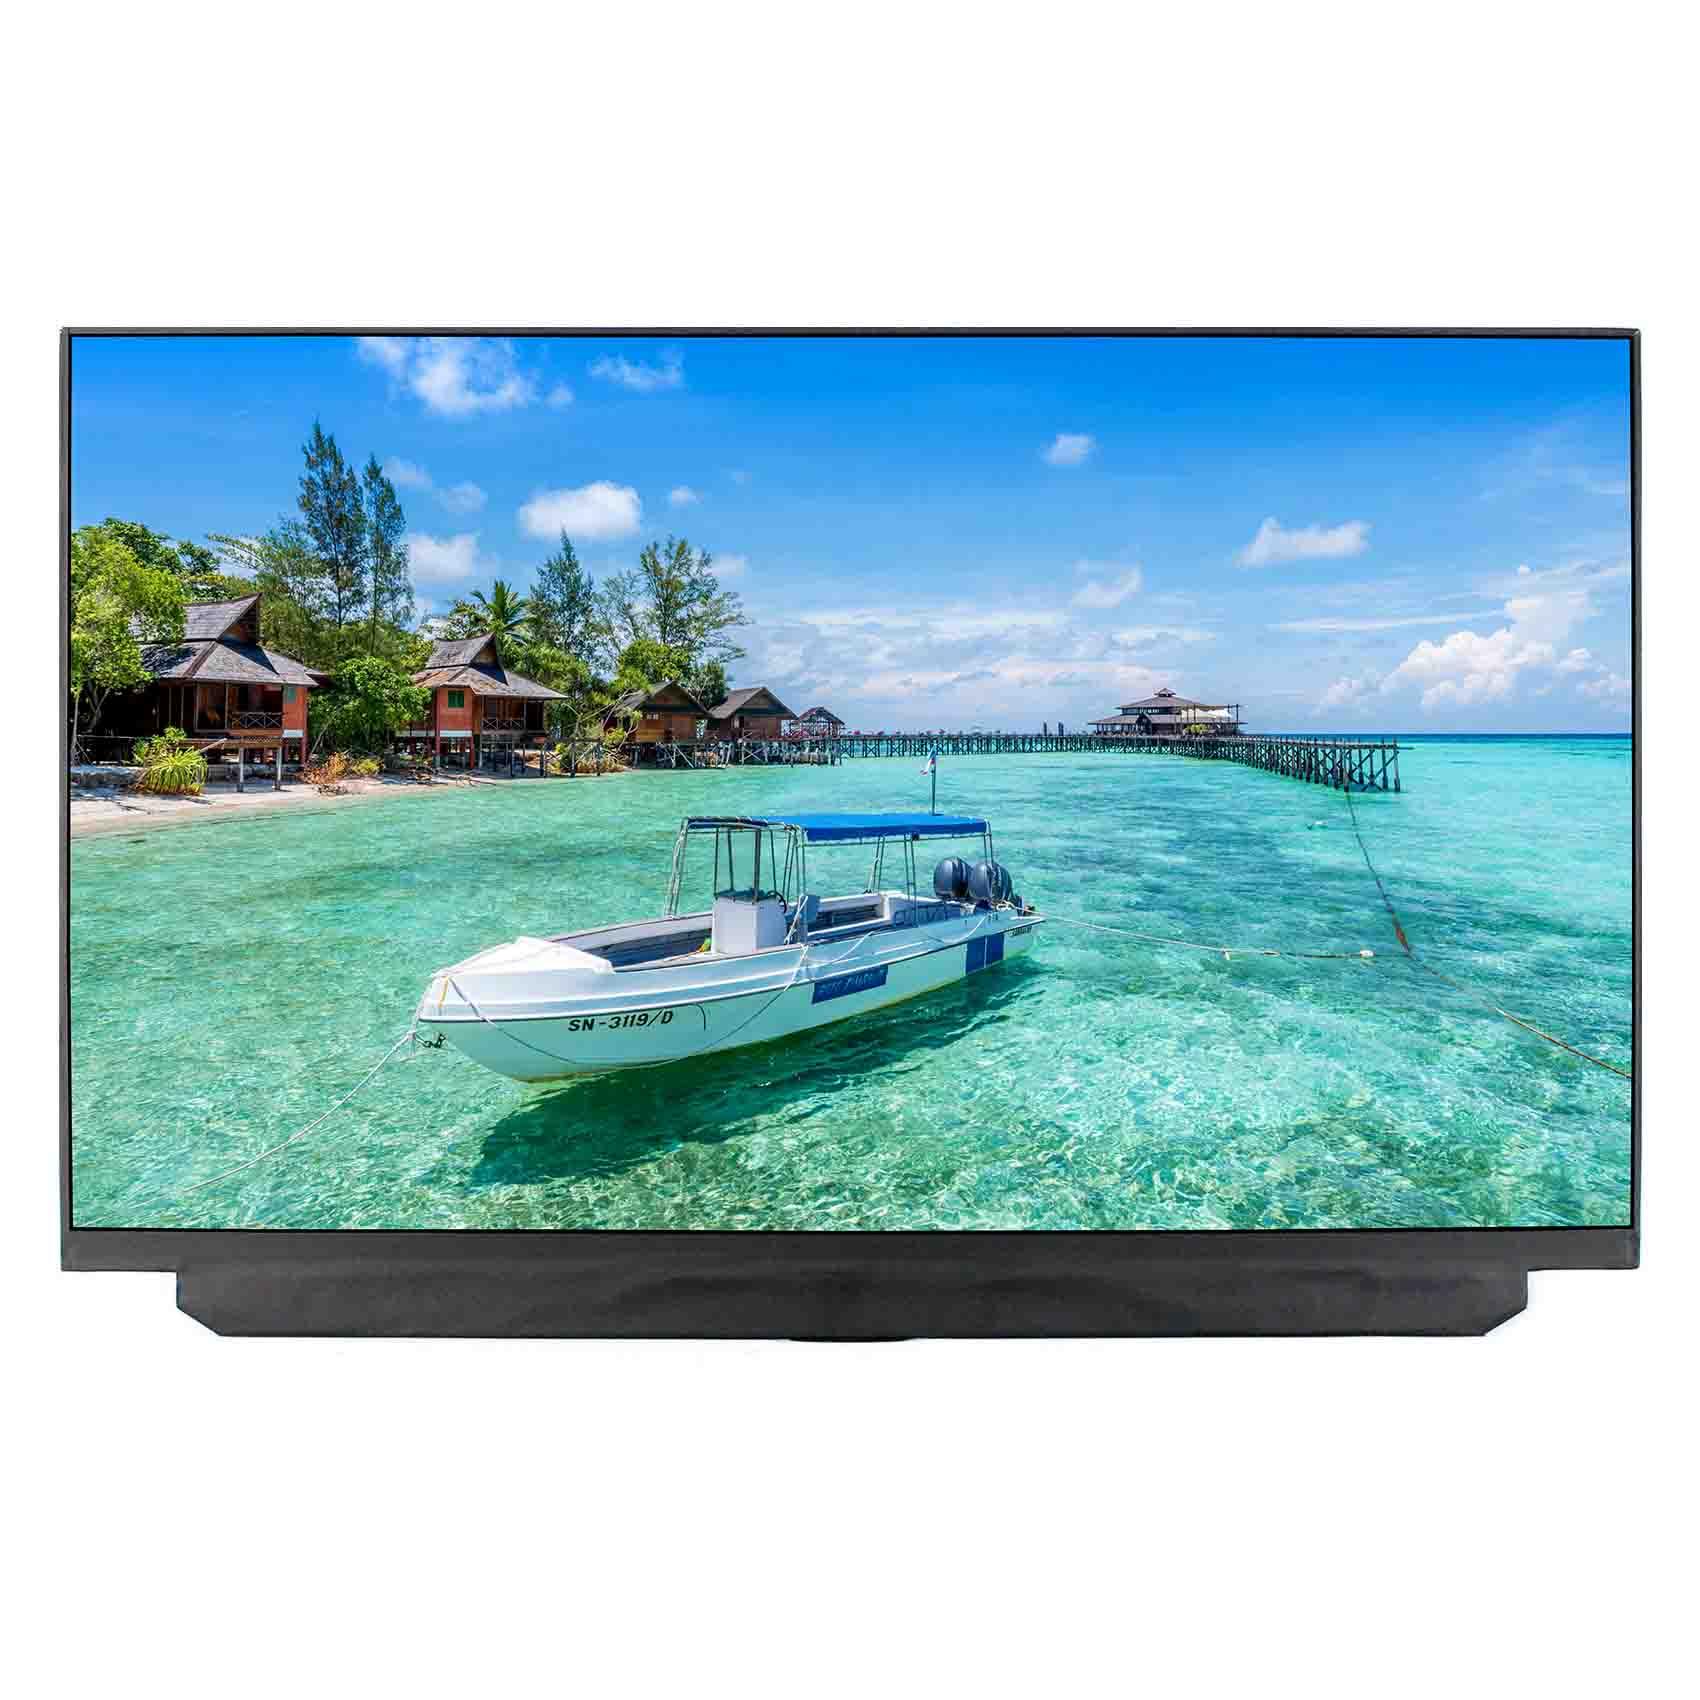 12.5inch LCD Screen 1920X1080 B125HAN02.2 FHD Display 30Pin eDP LCD Screen12.5inch LCD Screen 1920X1080 B125HAN02.2 FHD Display 30Pin eDP LCD Screen